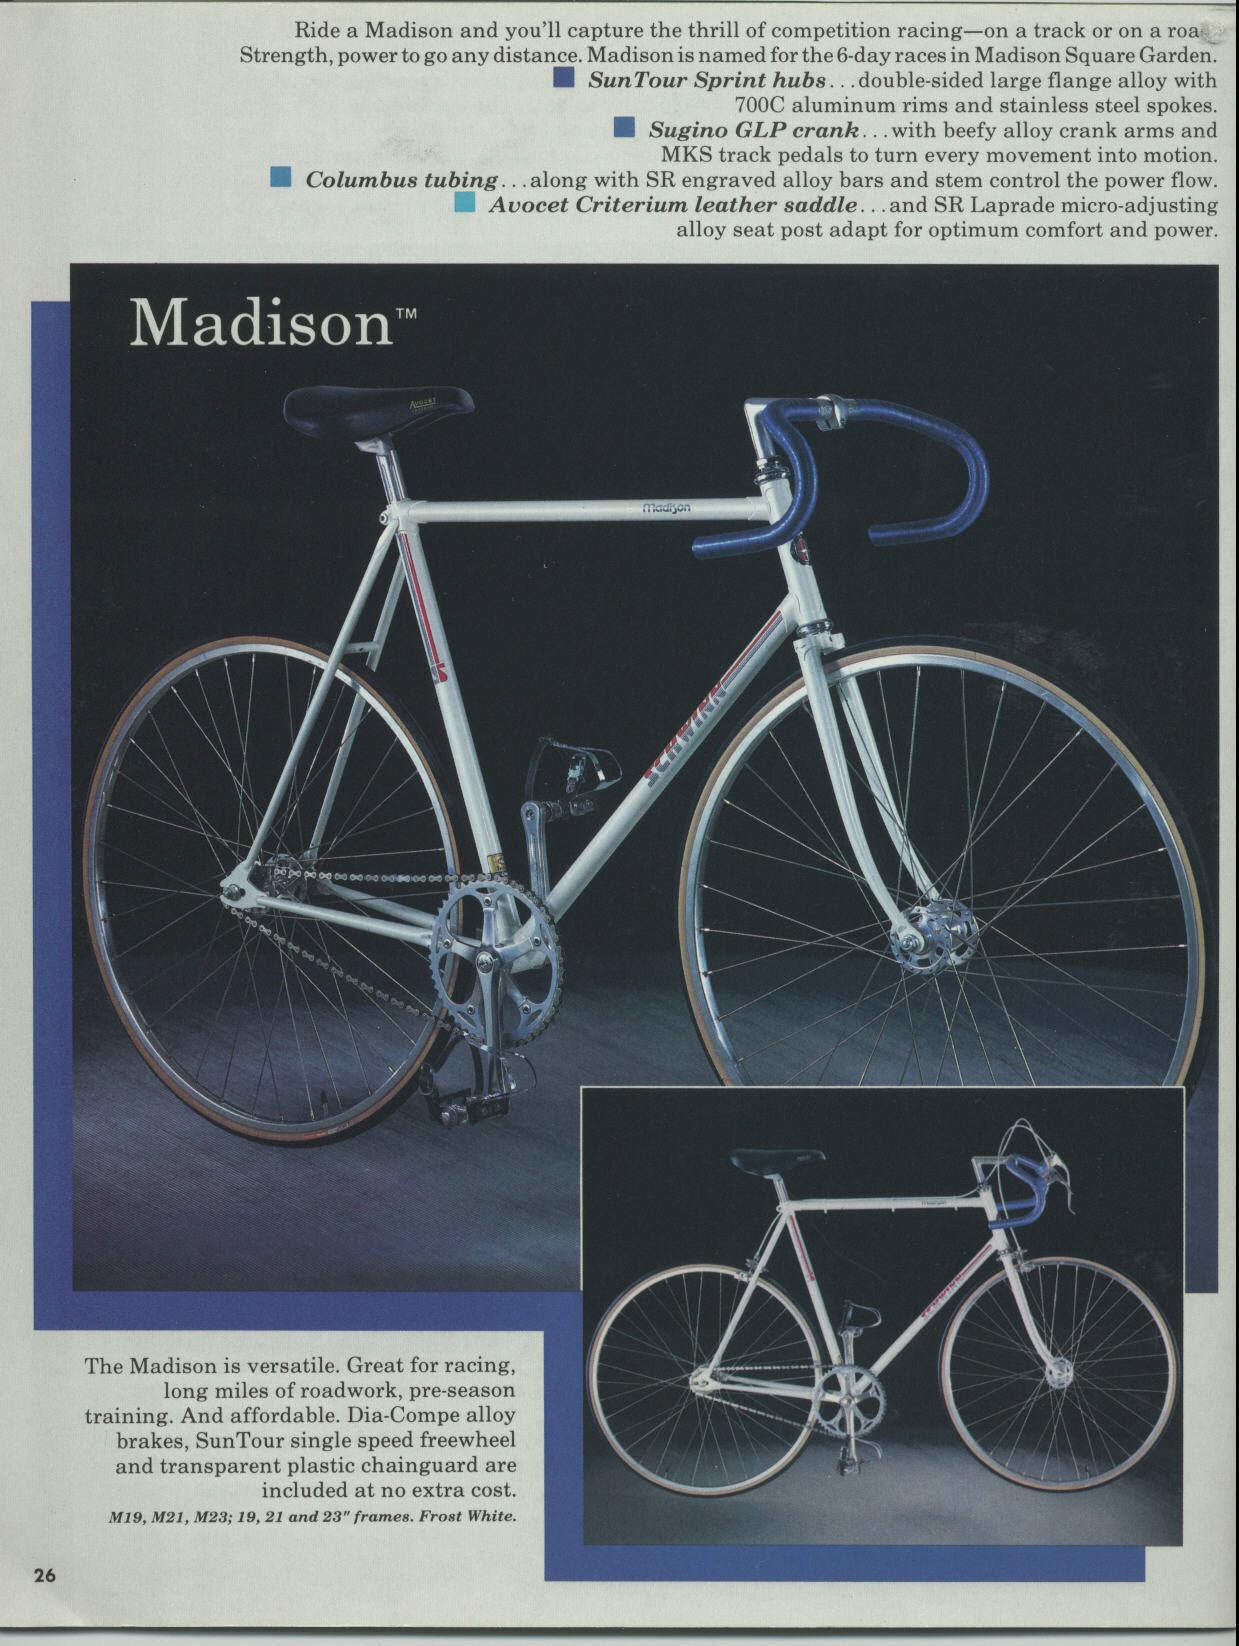 85madisonx1200.jpg